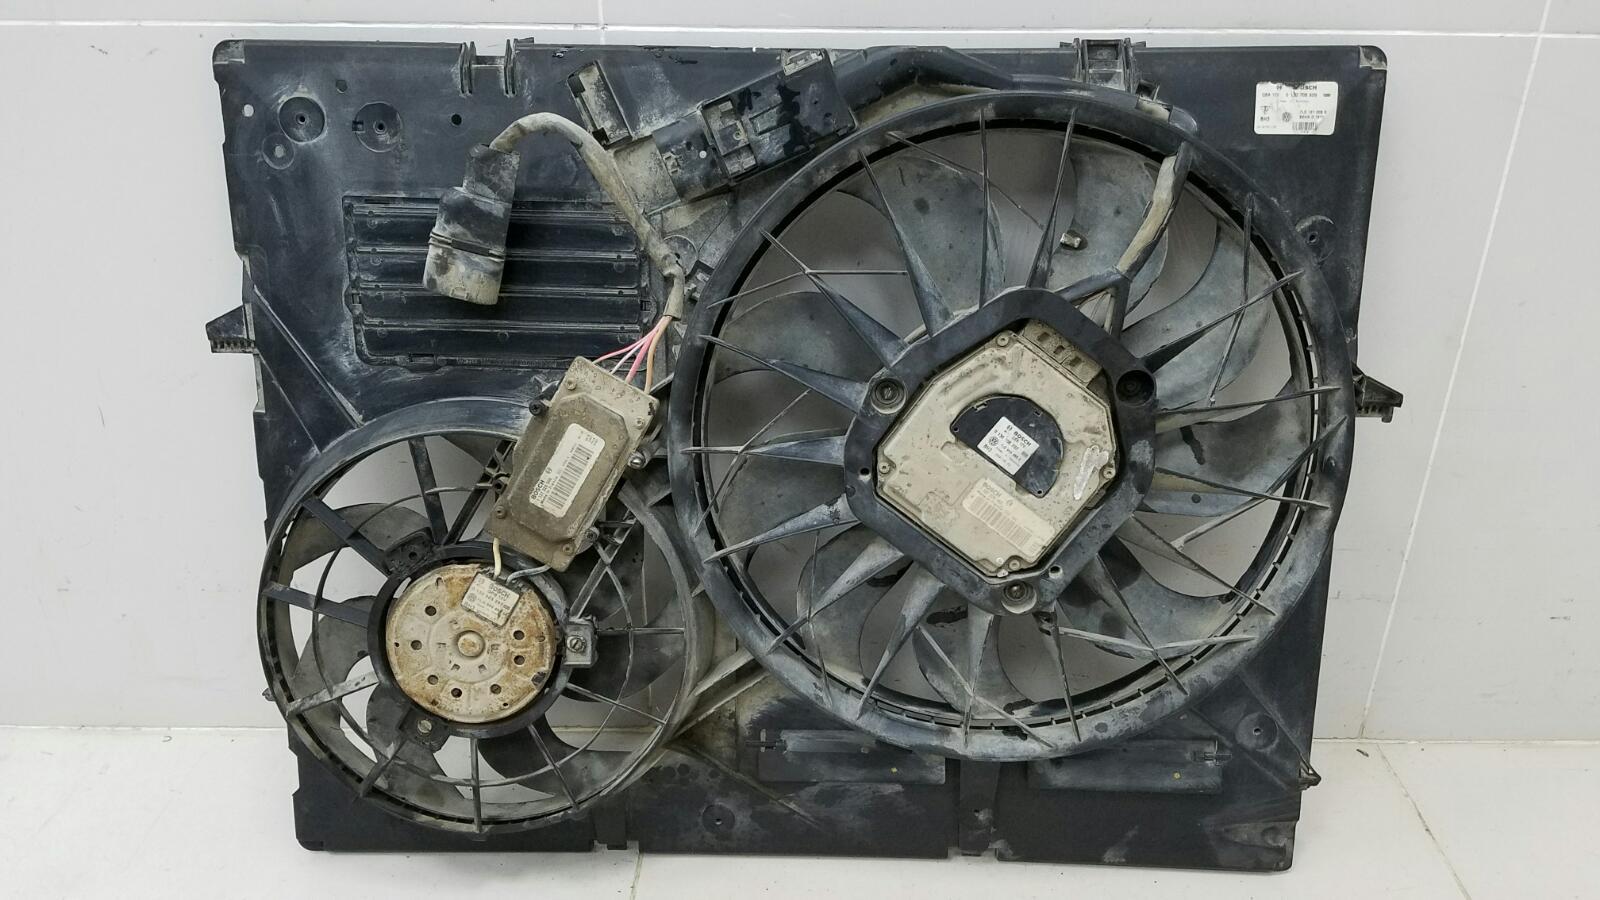 Вентилятор охлаждения радиатора Porshe Cayenne 955 BMV M02.2Y 3.2Л 2005